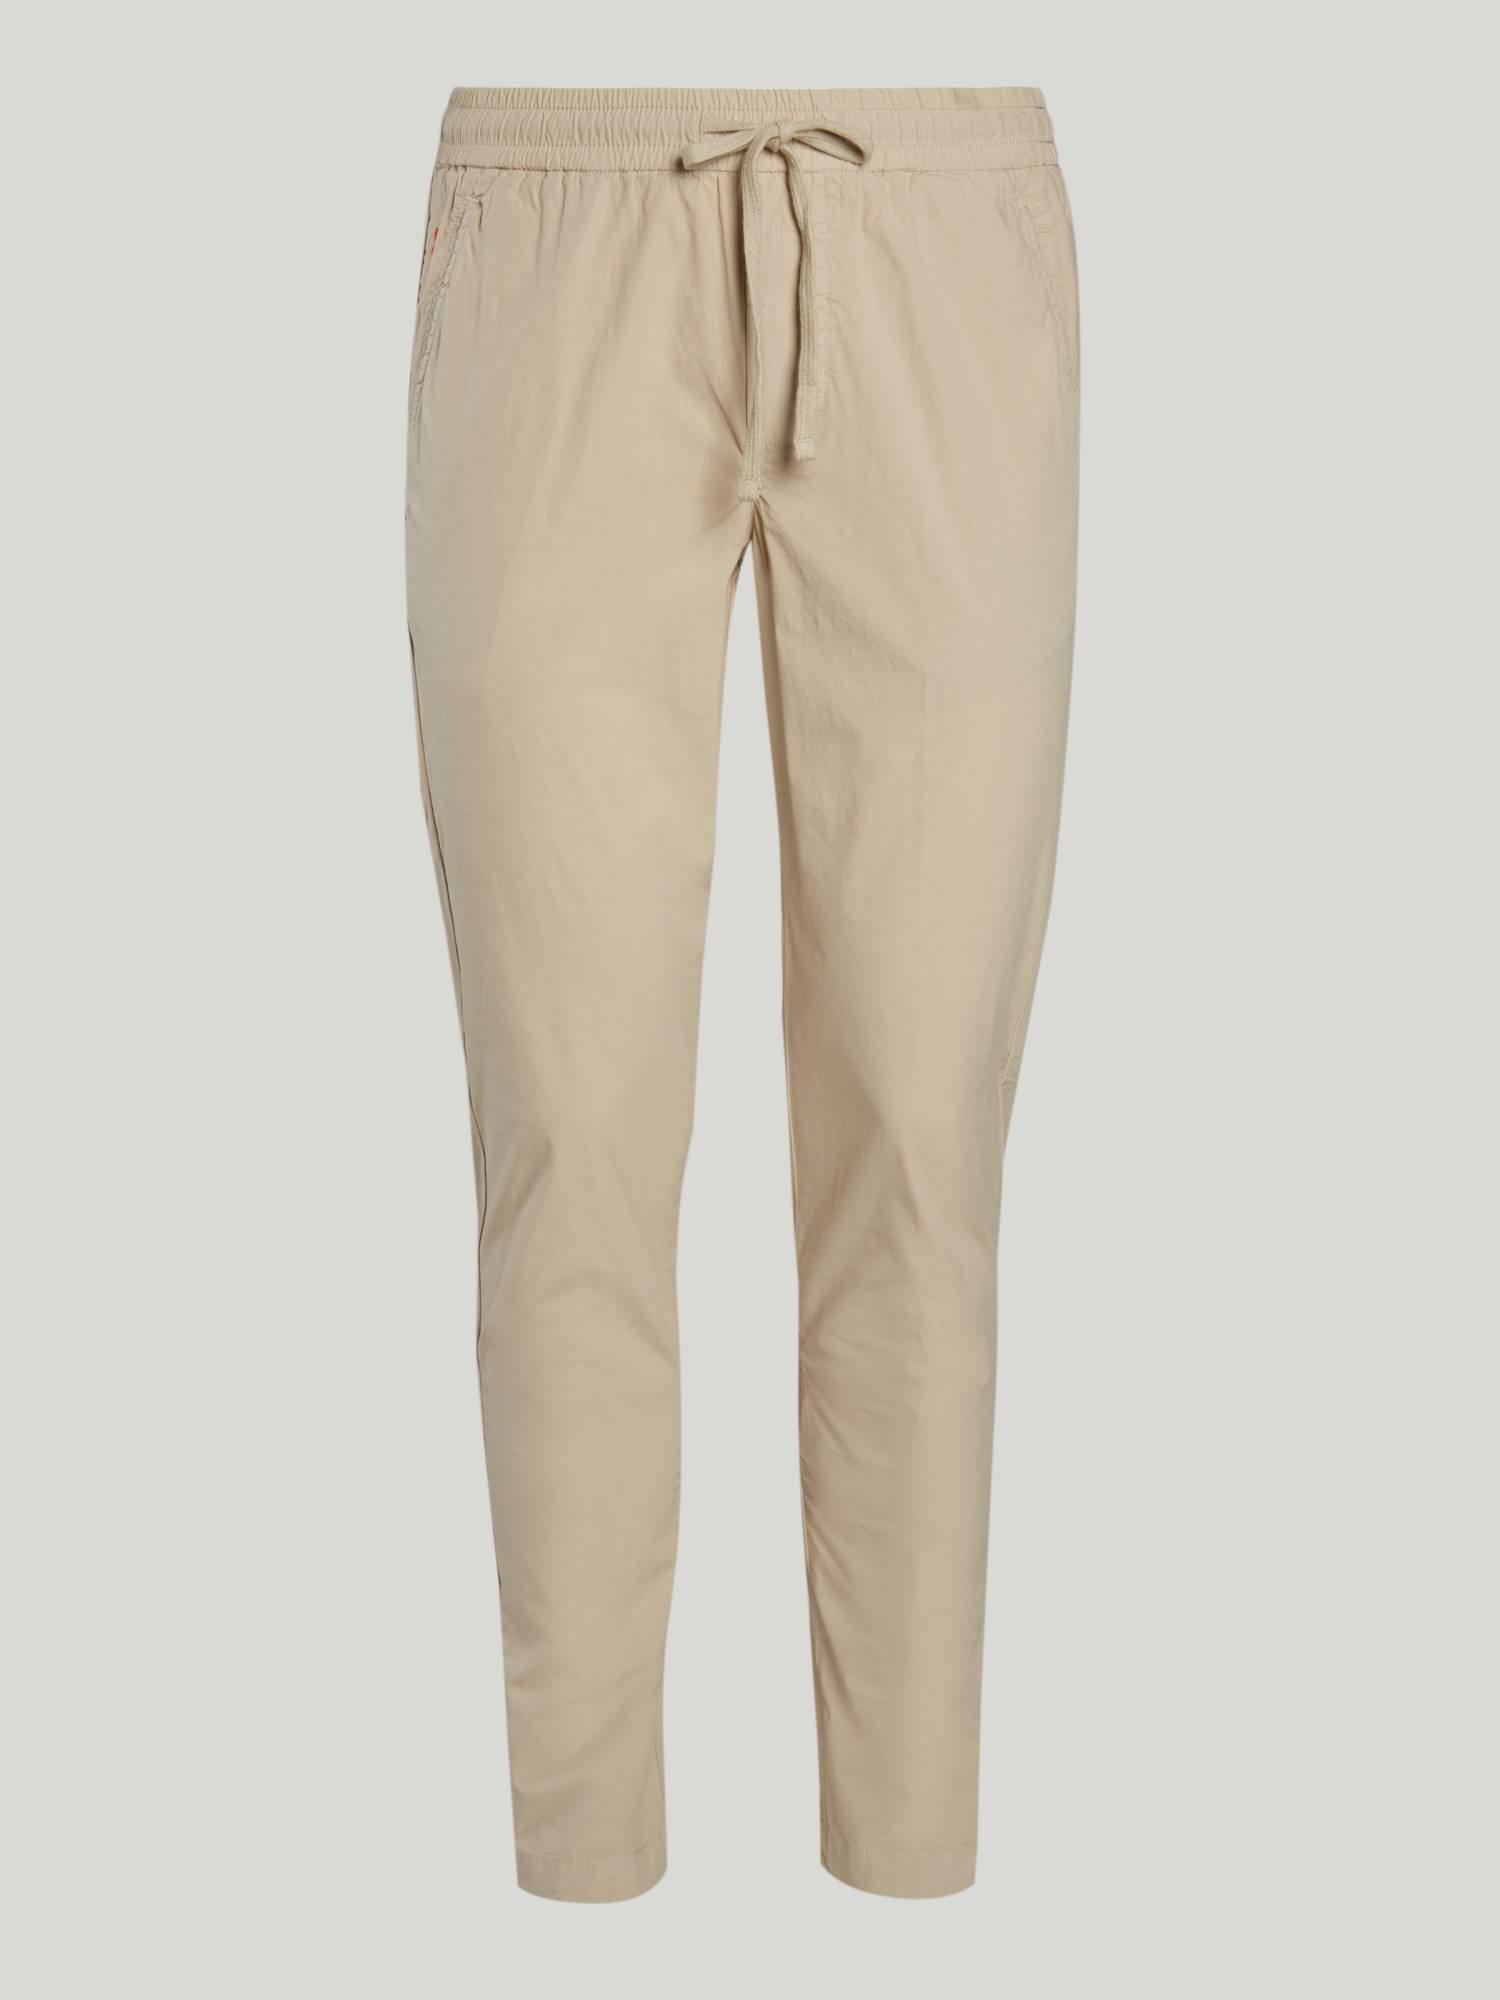 Trousers A78 - Pellicano